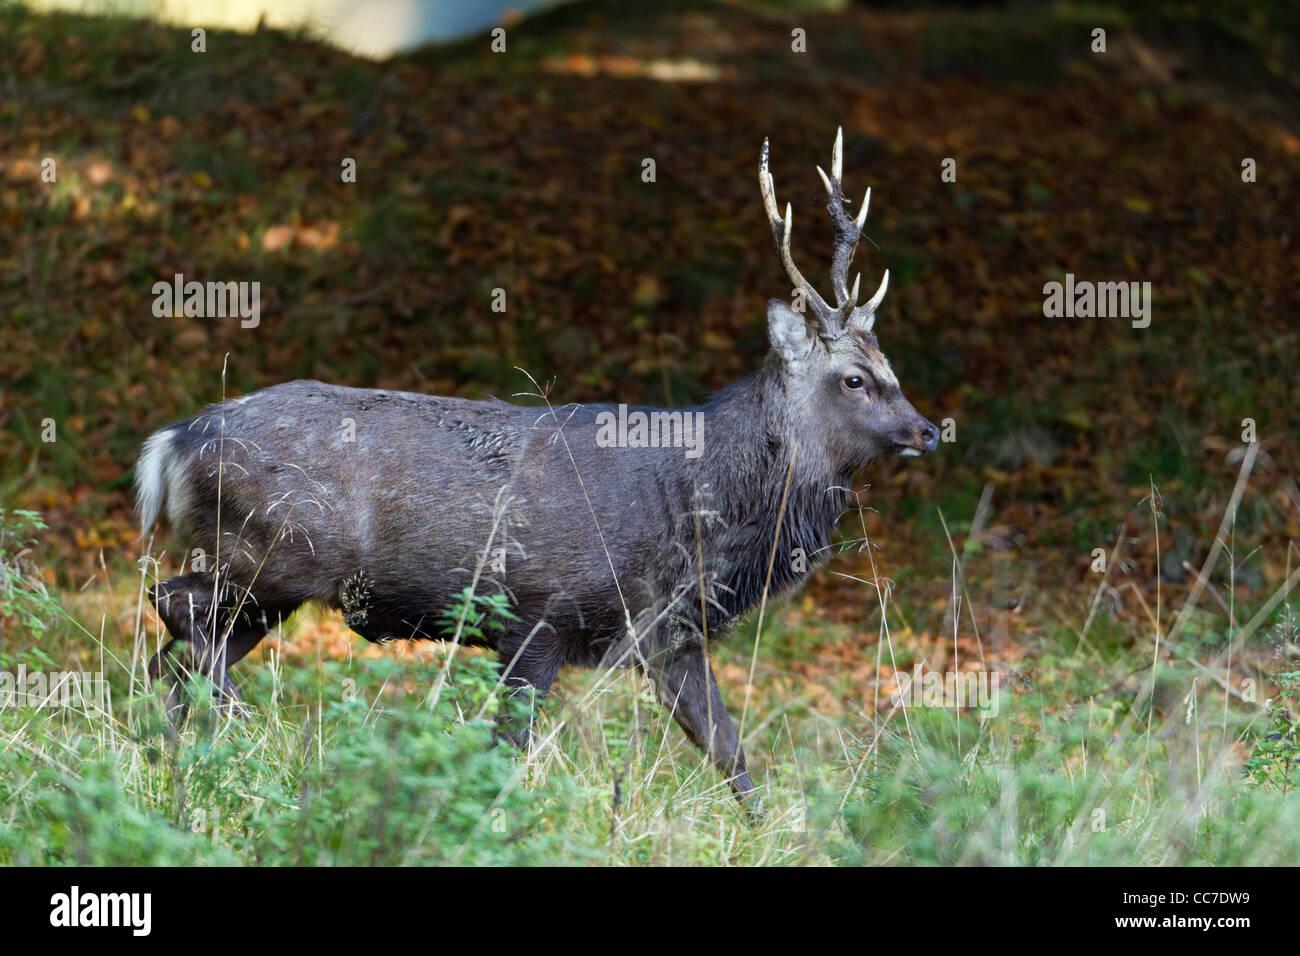 Sika cervo (Cervus nippon), feste di addio al celibato, Royal Deer Park , Klampenborg, Copenaghen, Sjaelland, Danimarca Immagini Stock